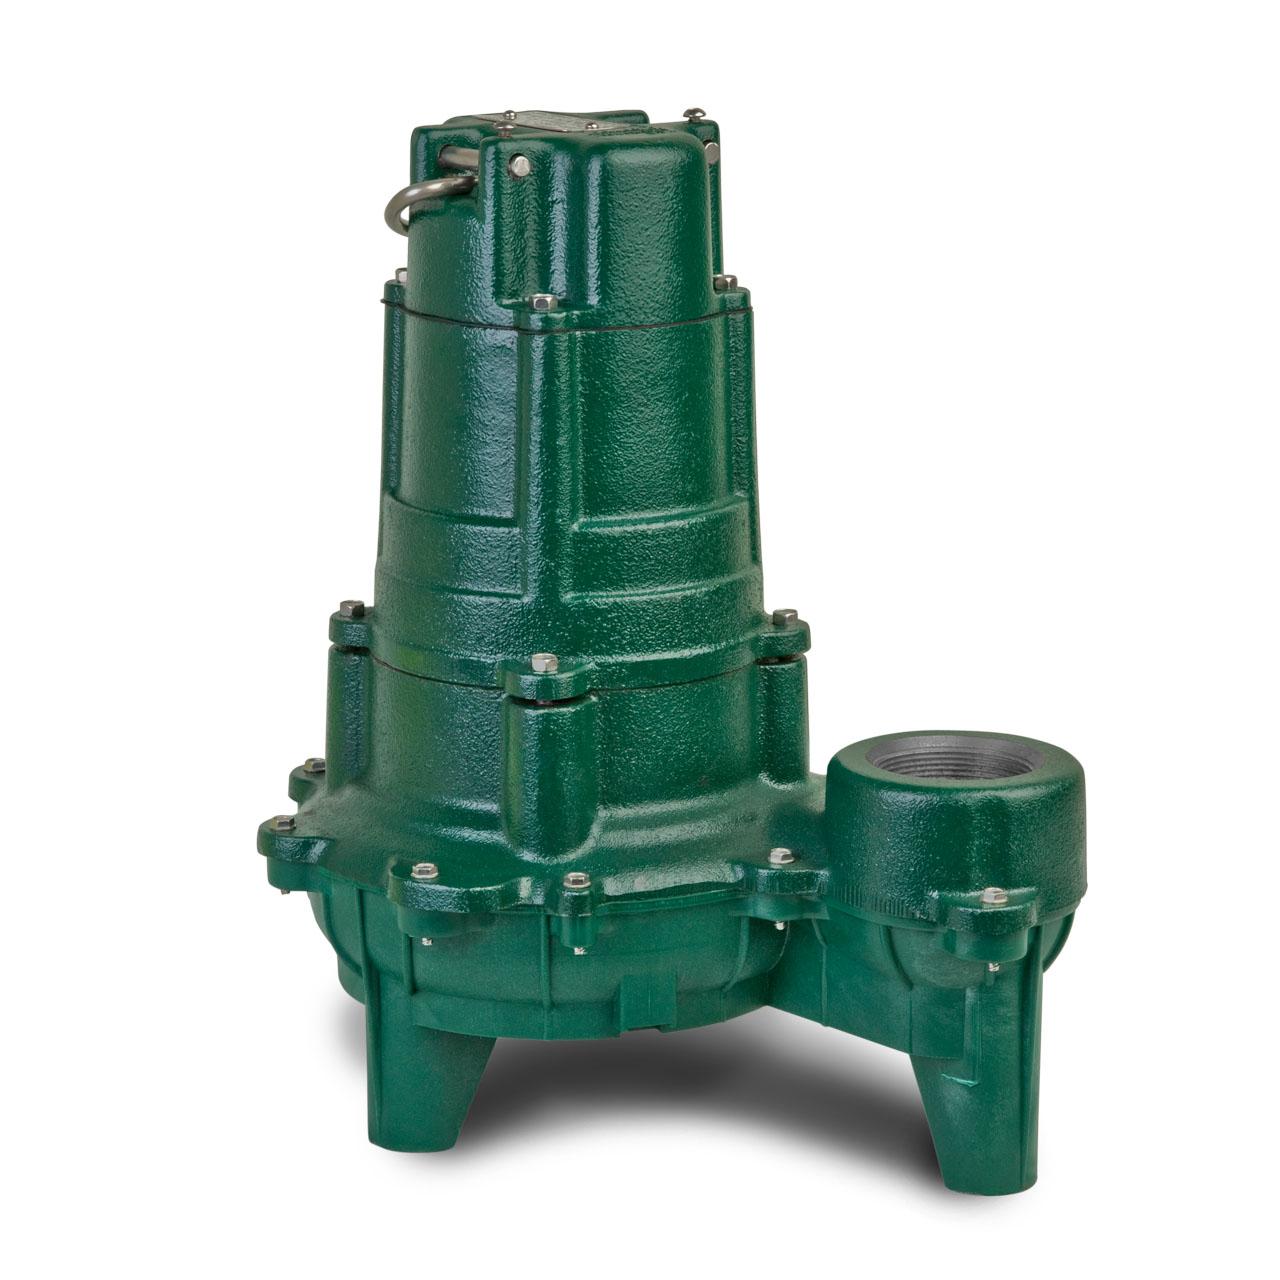 zoeller zoeller 270 0002 model n270 sewage effluent or zoeller zoeller 270 0002 model n270 sewage effluent or dewatering pump 1 0 hp 115v 1ph 20 cord nonautomatic zlr270 0002